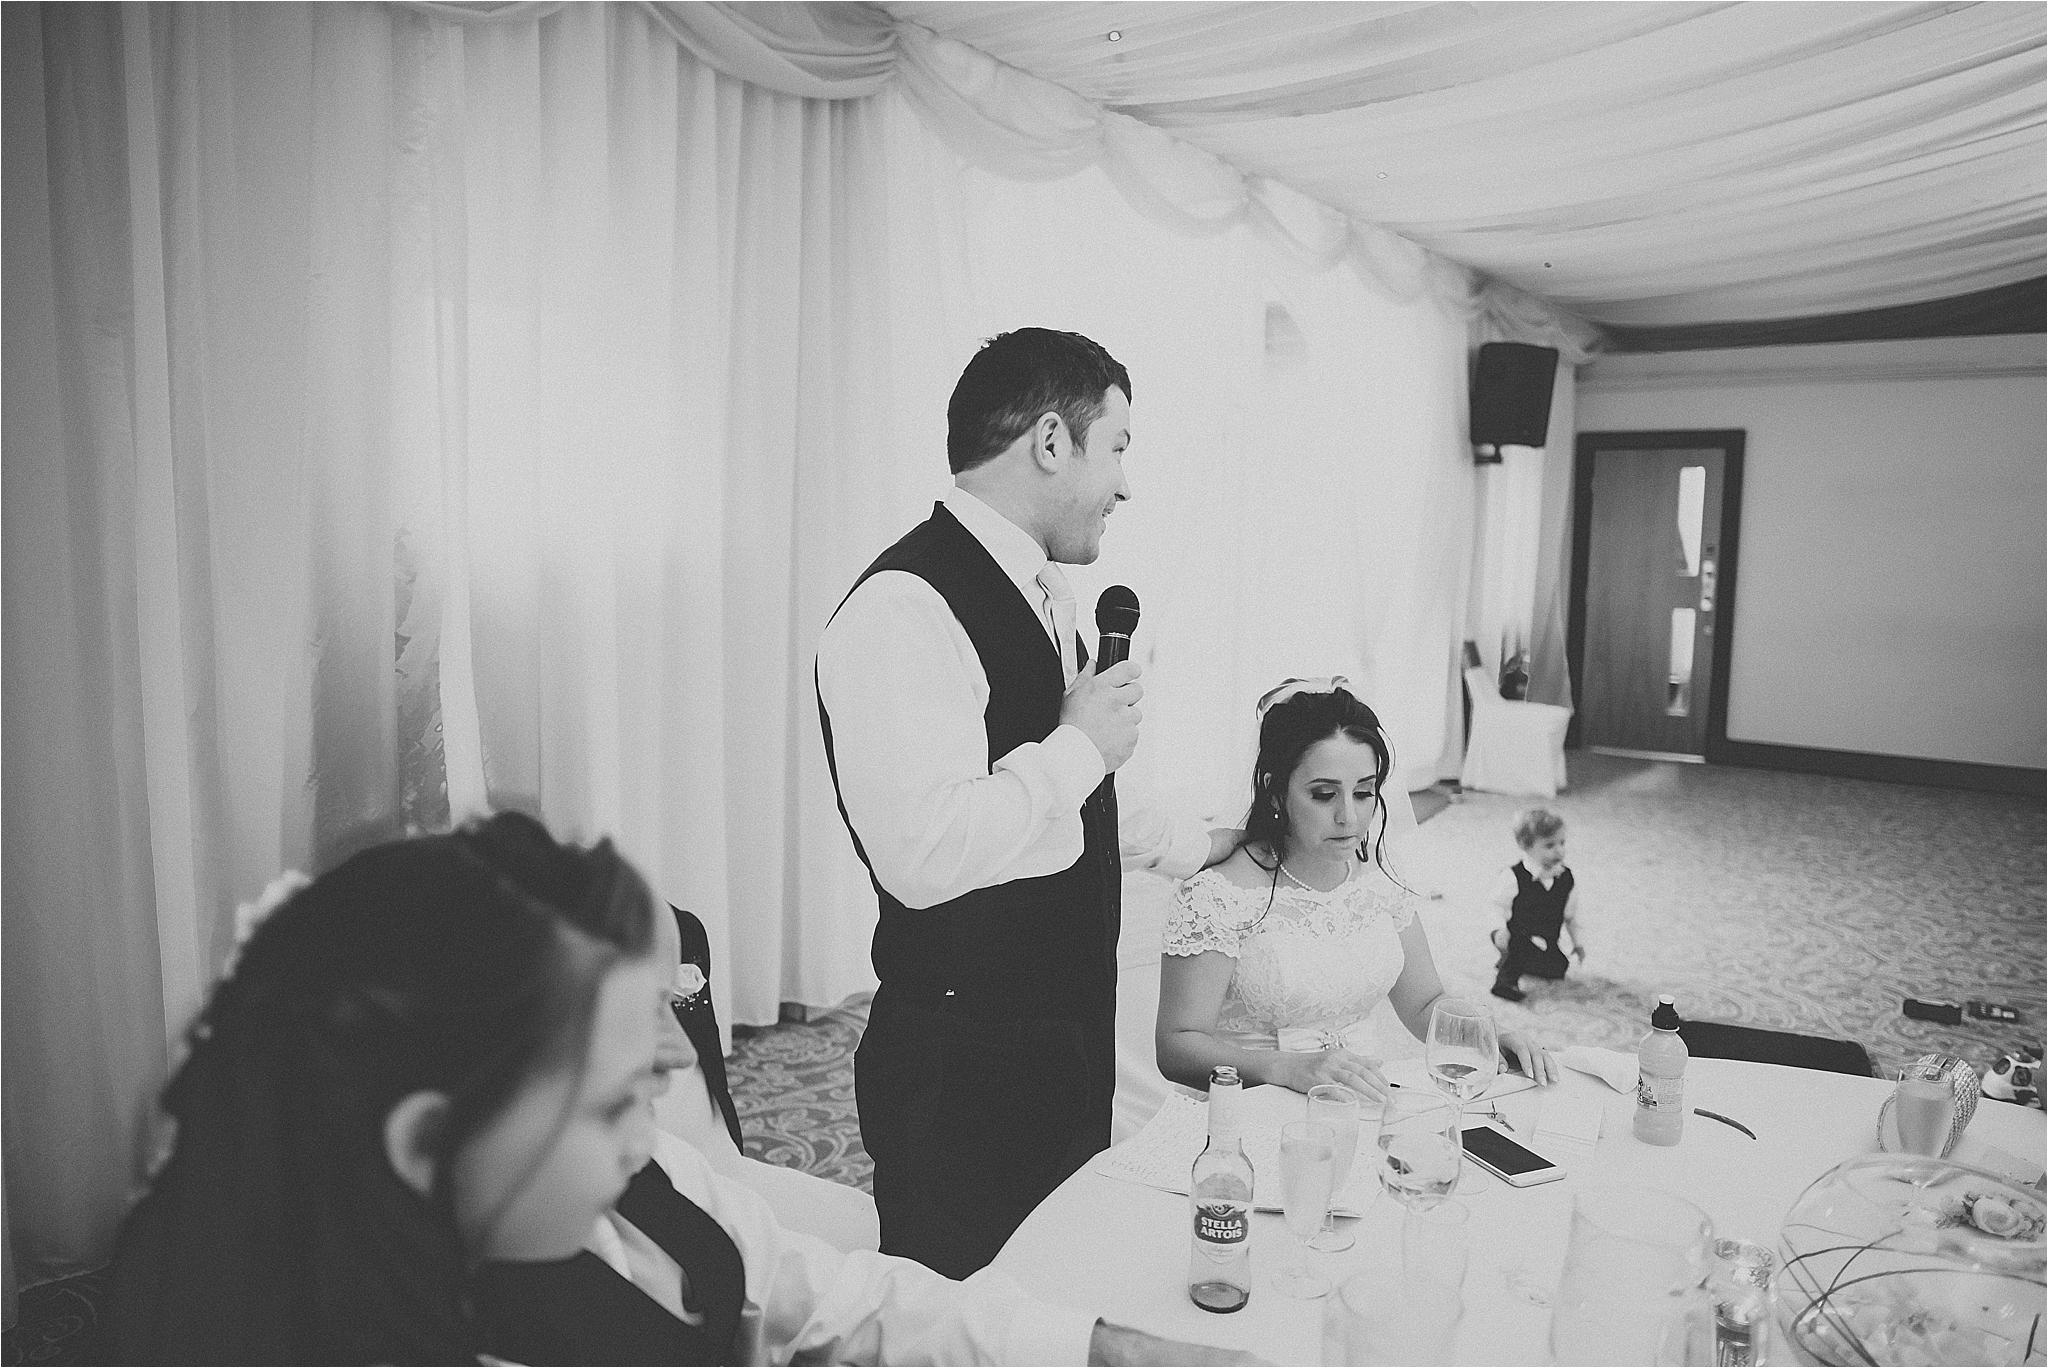 thevilla+lancashire+wreagreen+wedding+photographer106.jpg